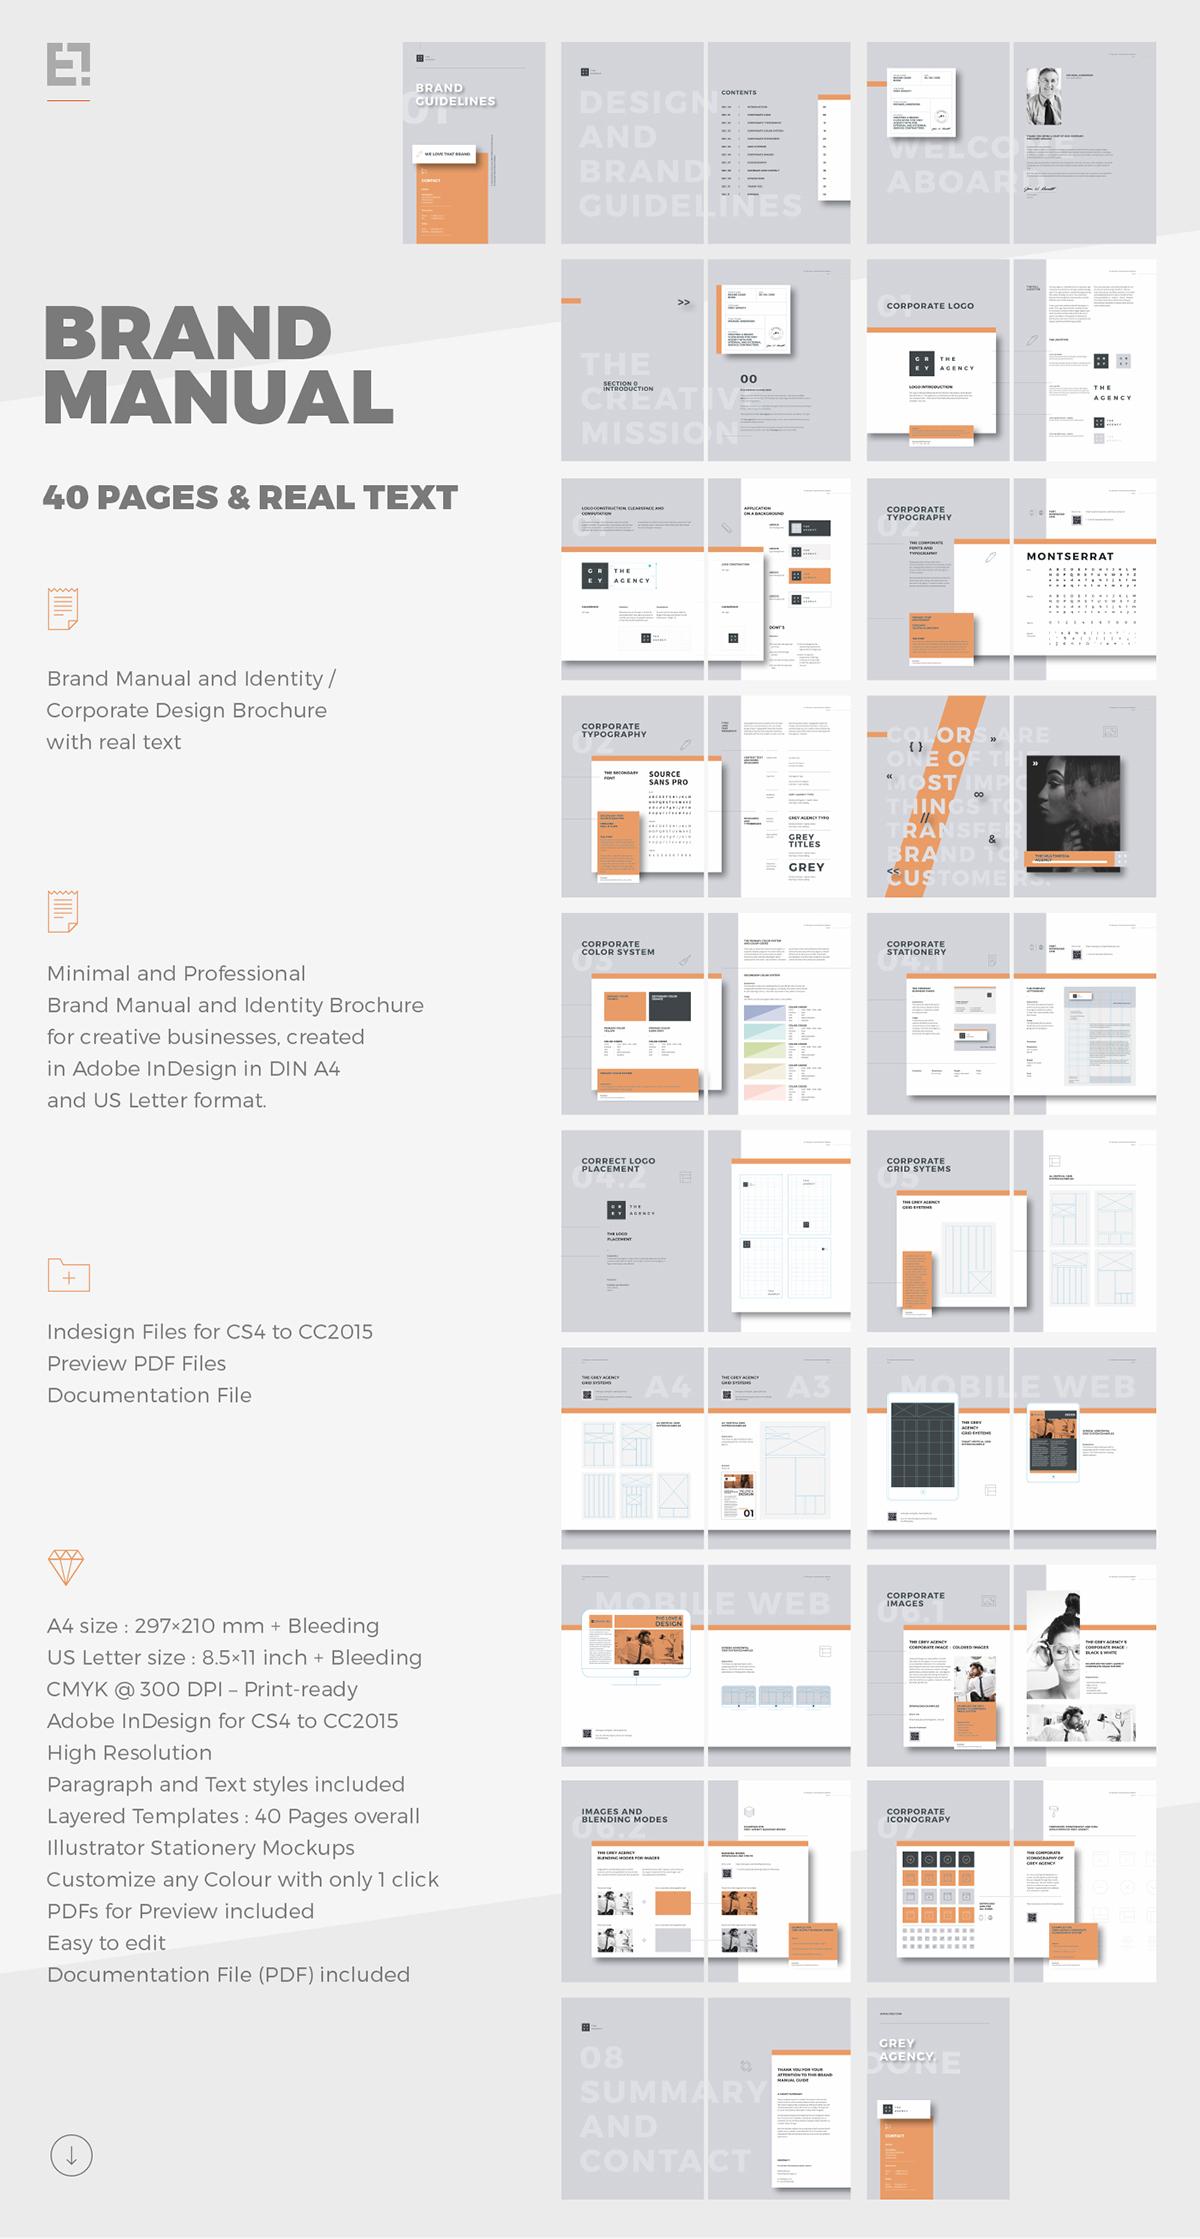 Adobe Cs4 Manual Pdf